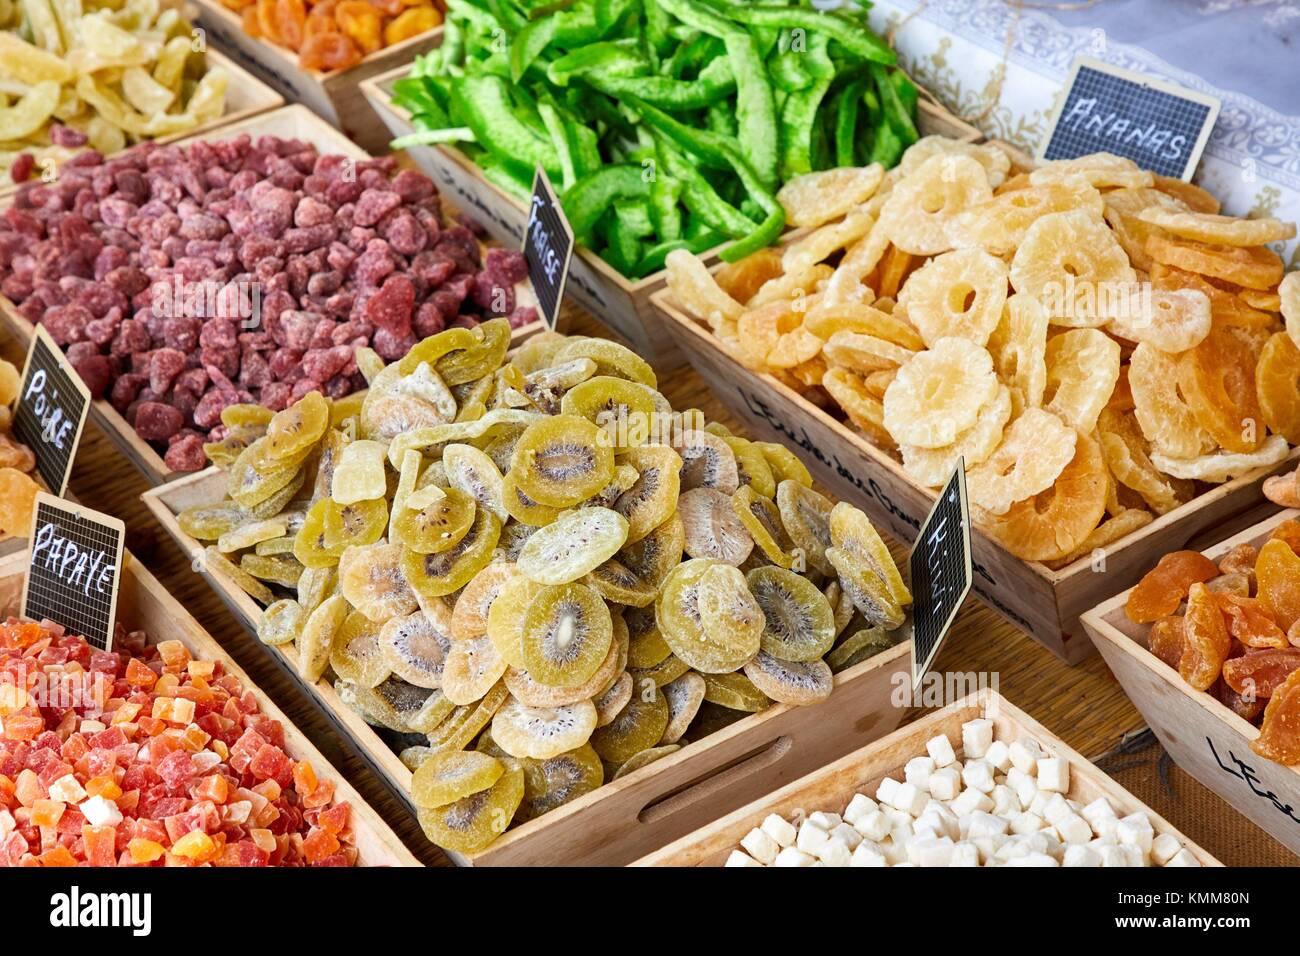 Market, Beaune, Côte d´Or, Burgundy Region, Bourgogne, France, Europe - Stock Image